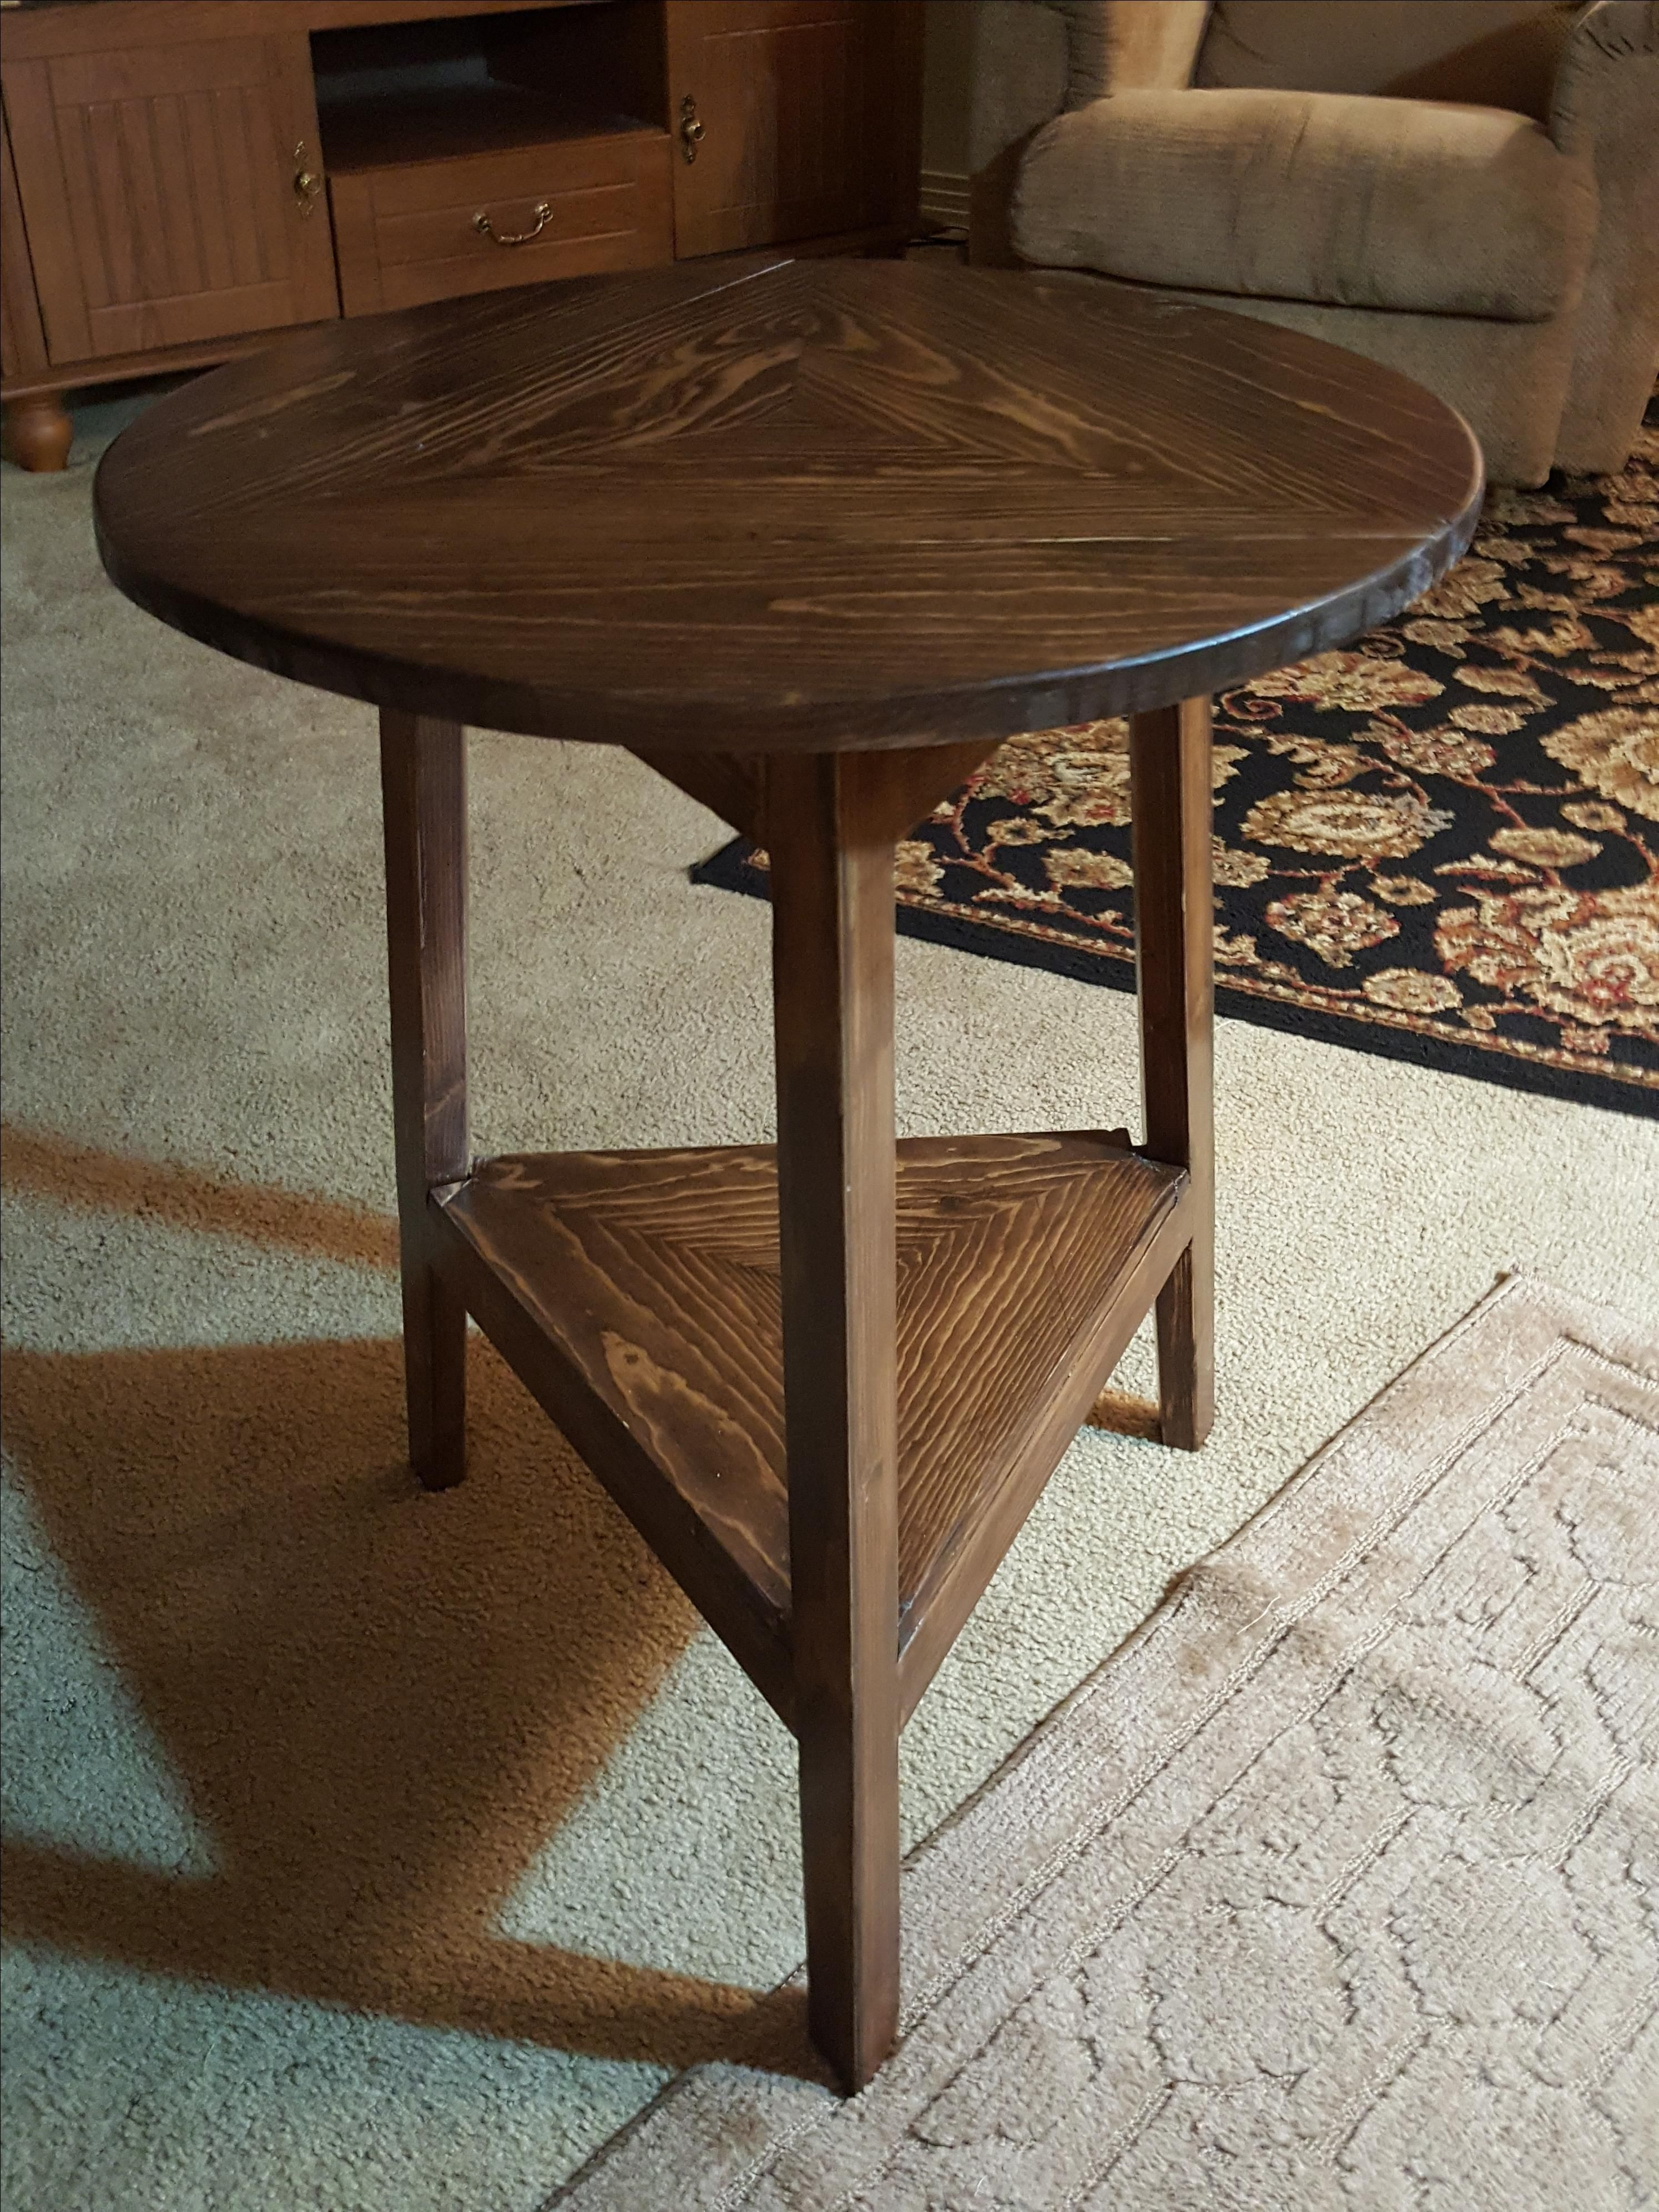 Custom Cricket Drop Leaf Side Table With A Twist By Purple Rag